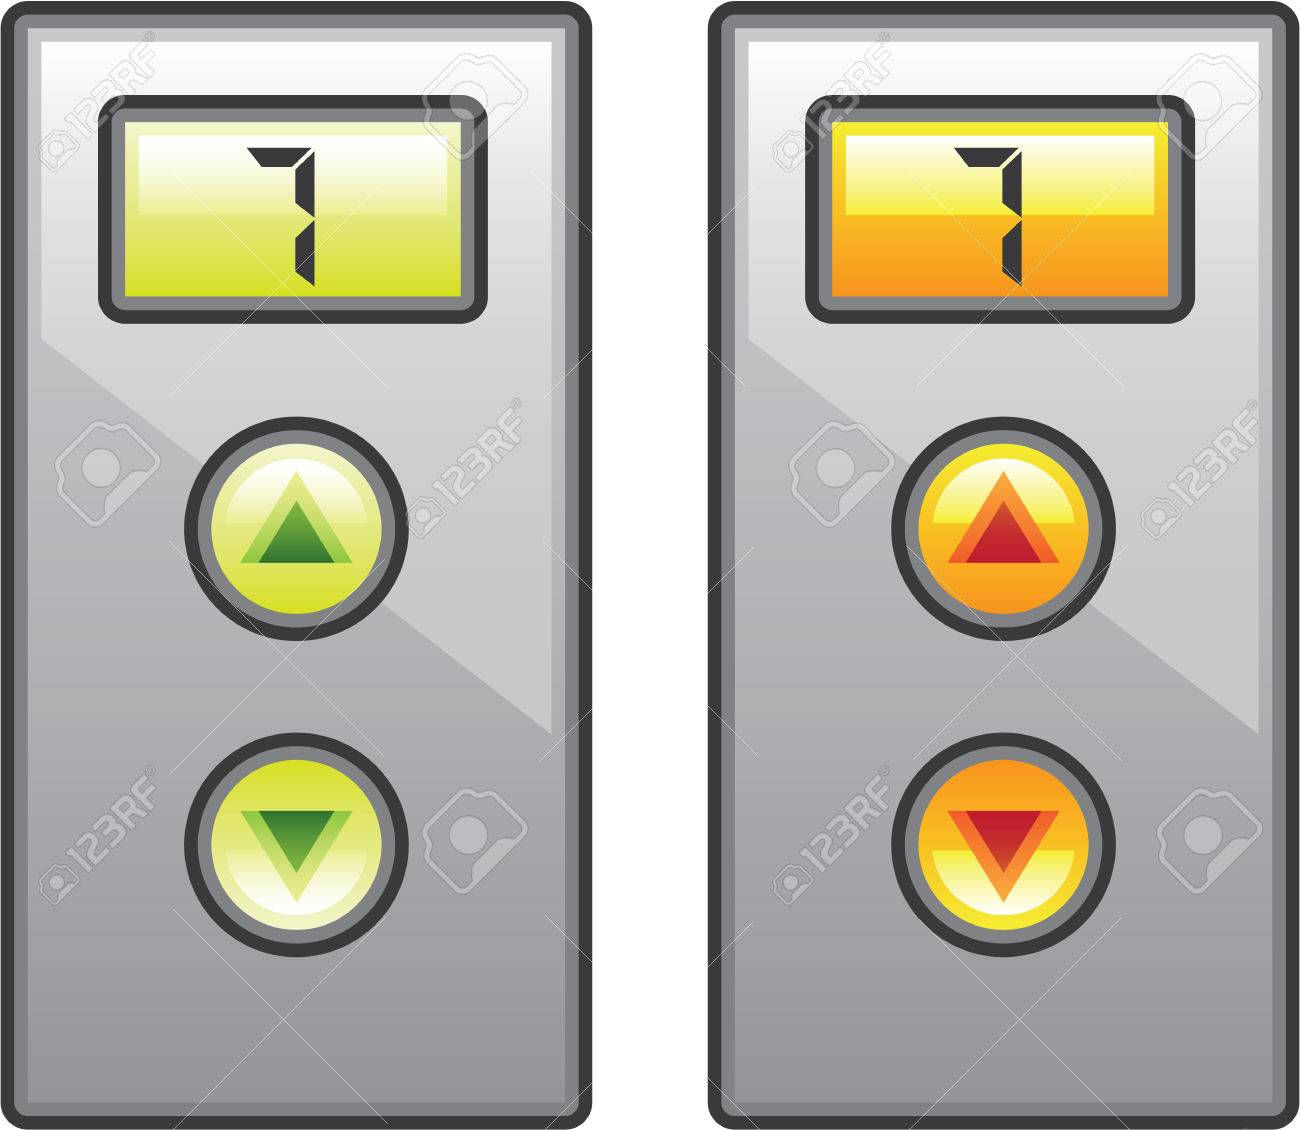 elevator buttons vector illustration clip art image royalty free rh 123rf com